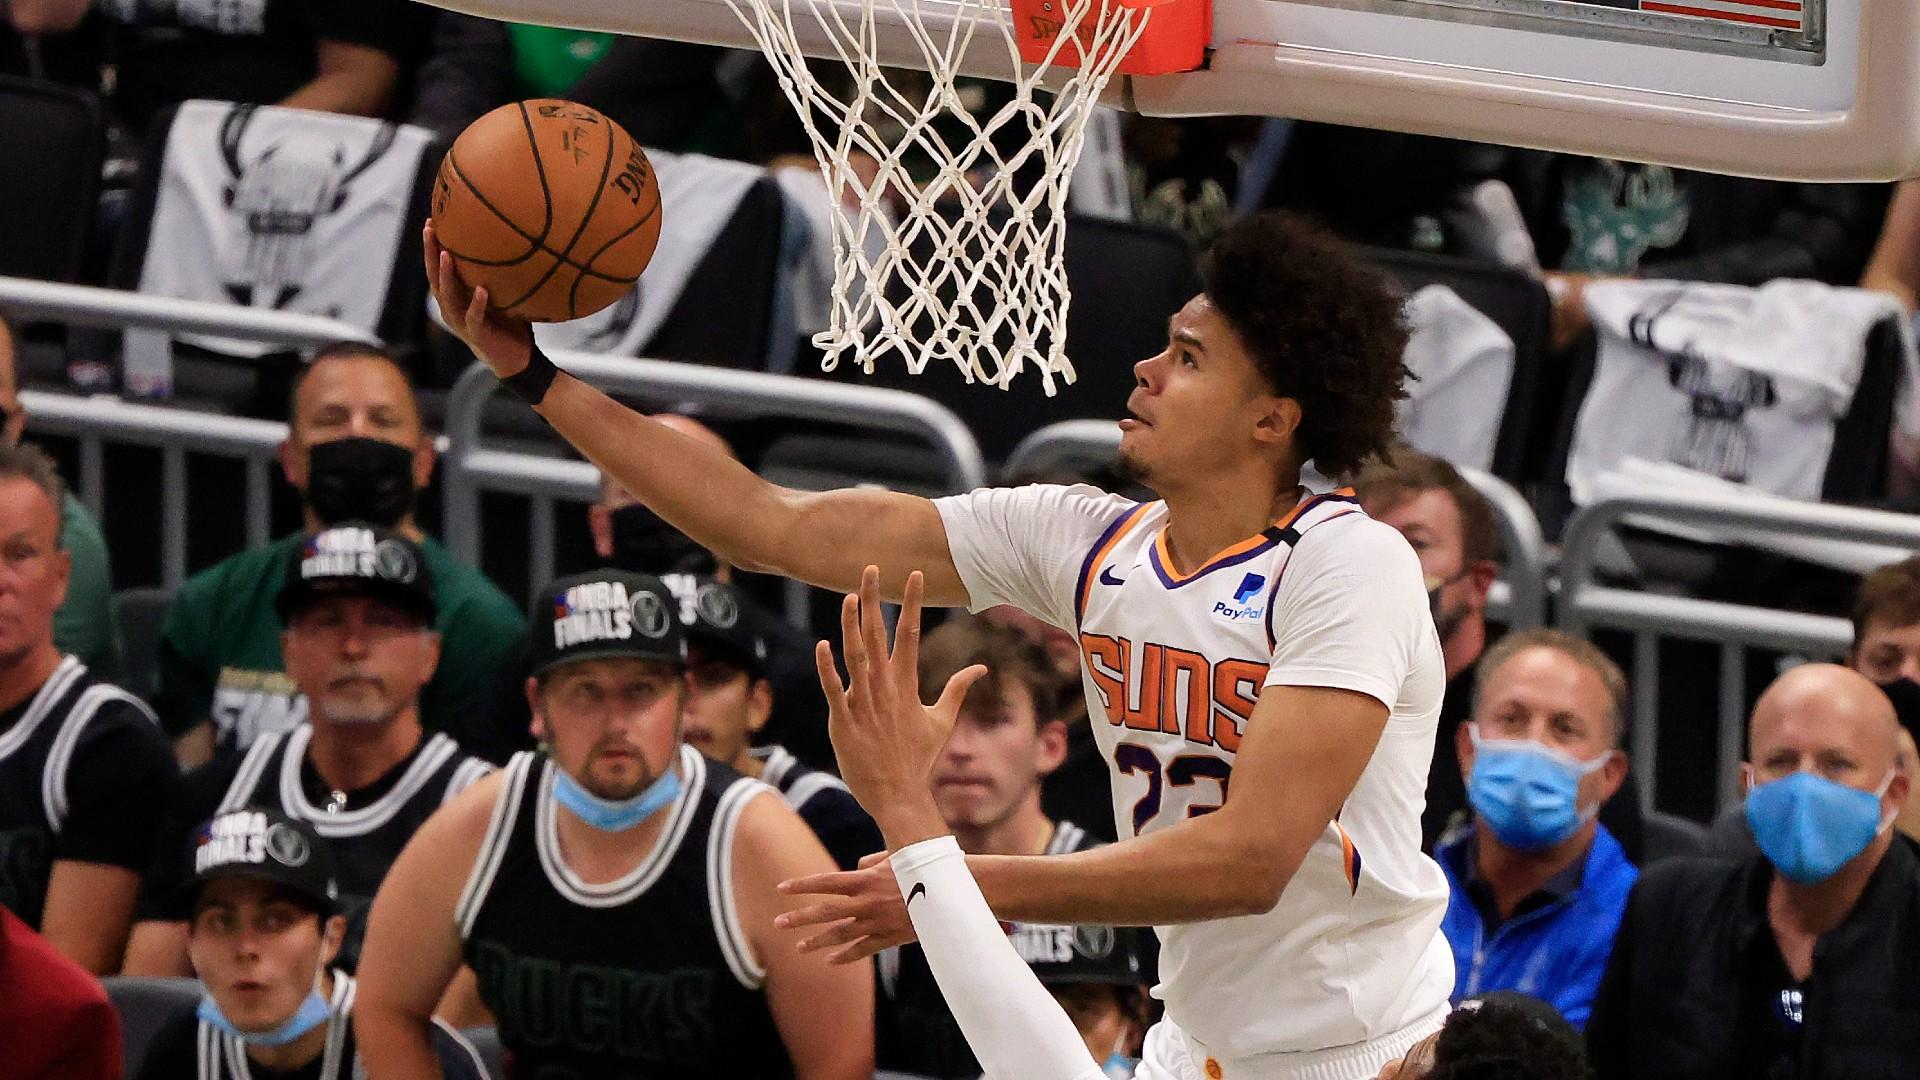 Cameron Johnson's ridiculous dunk on PJ Tucker births hilarious new NBA meme